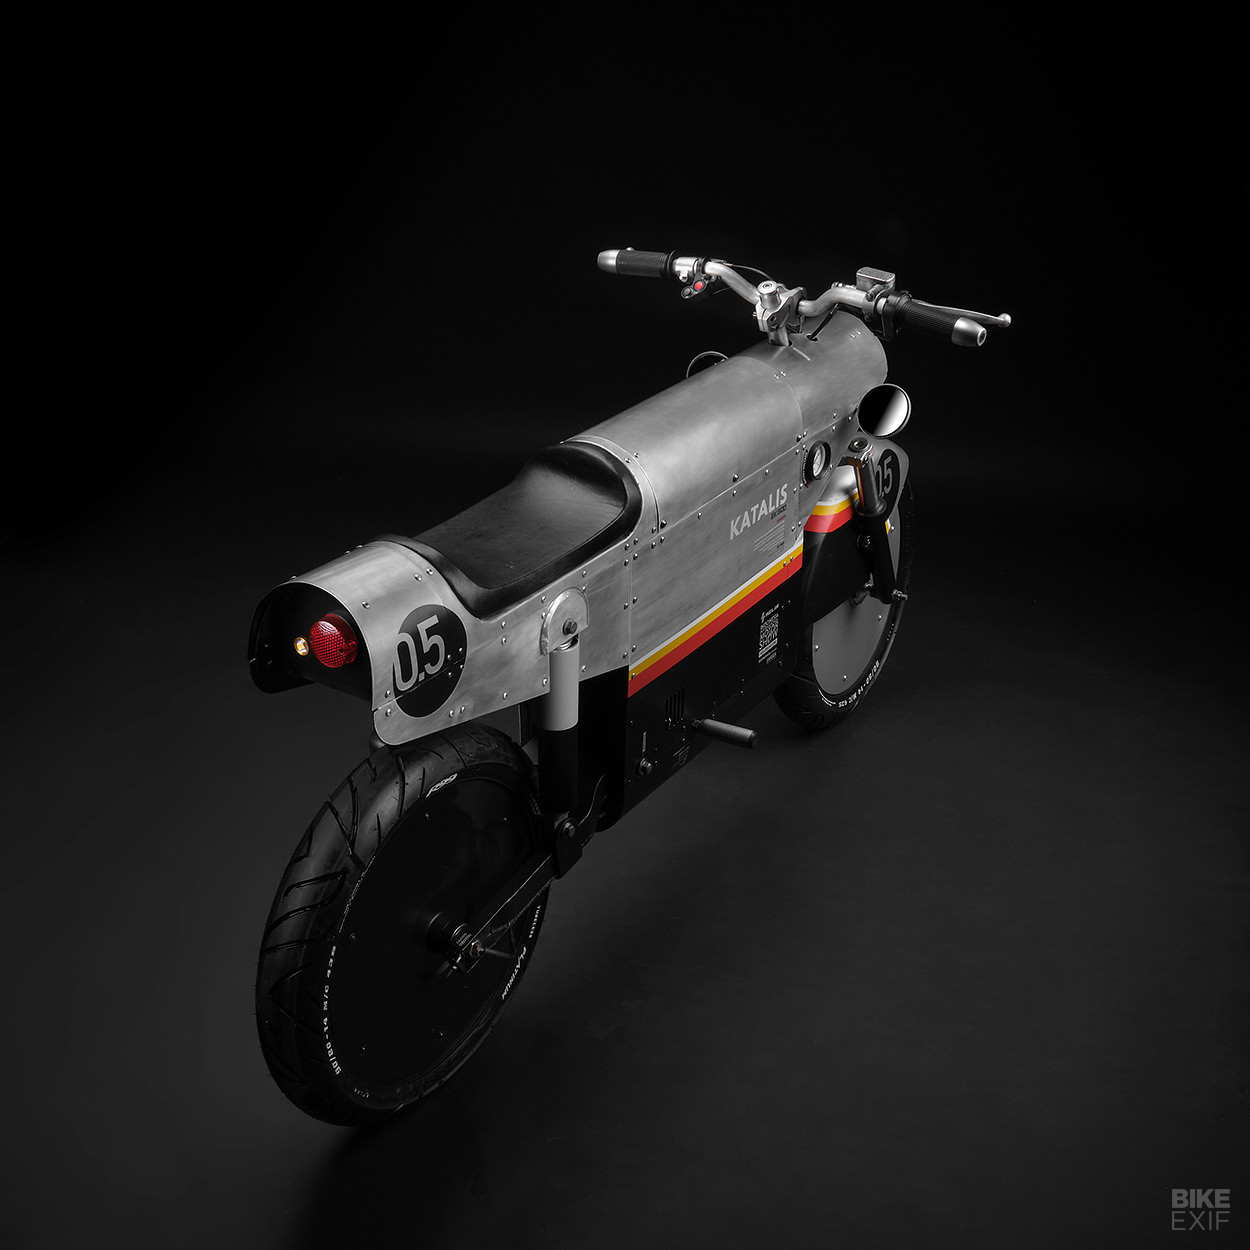 The Katalis EV.500, an electric motorcycle concept based on the Selis Garuda